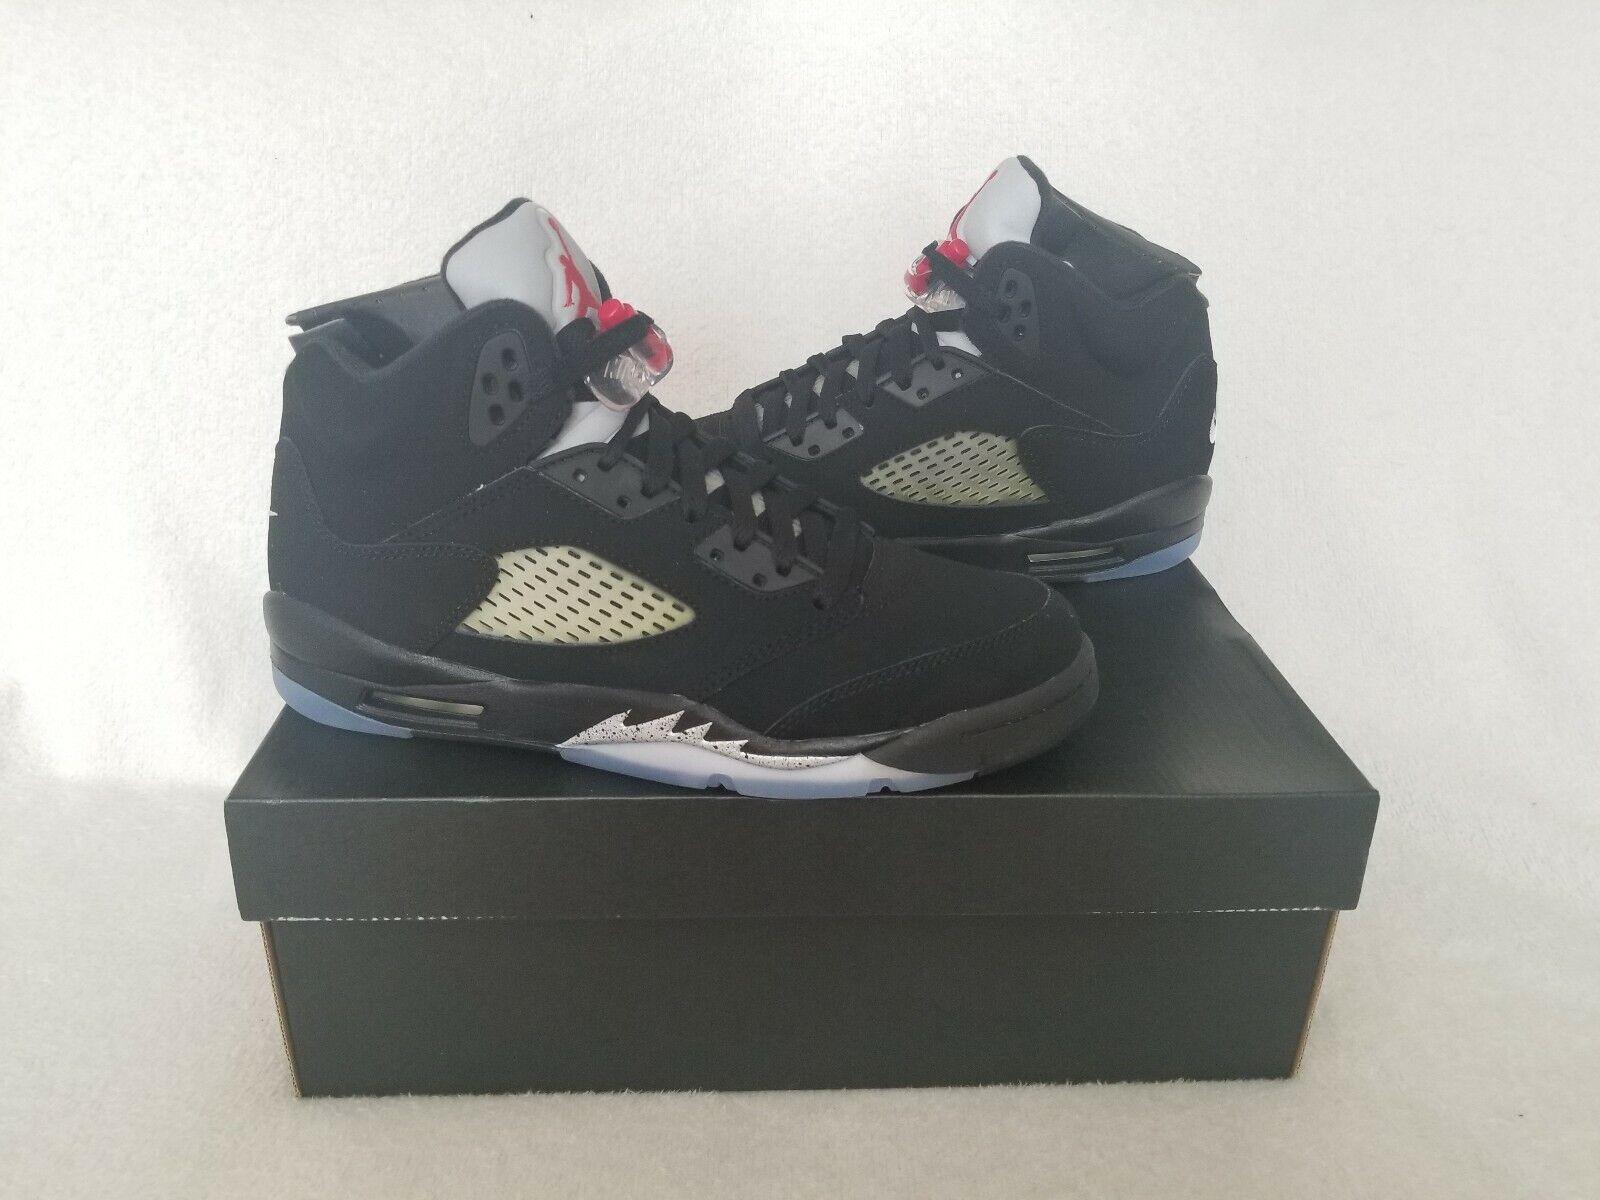 2016 (OG) Retro Jordan  Metallic BLK  5's in A Size  7.0